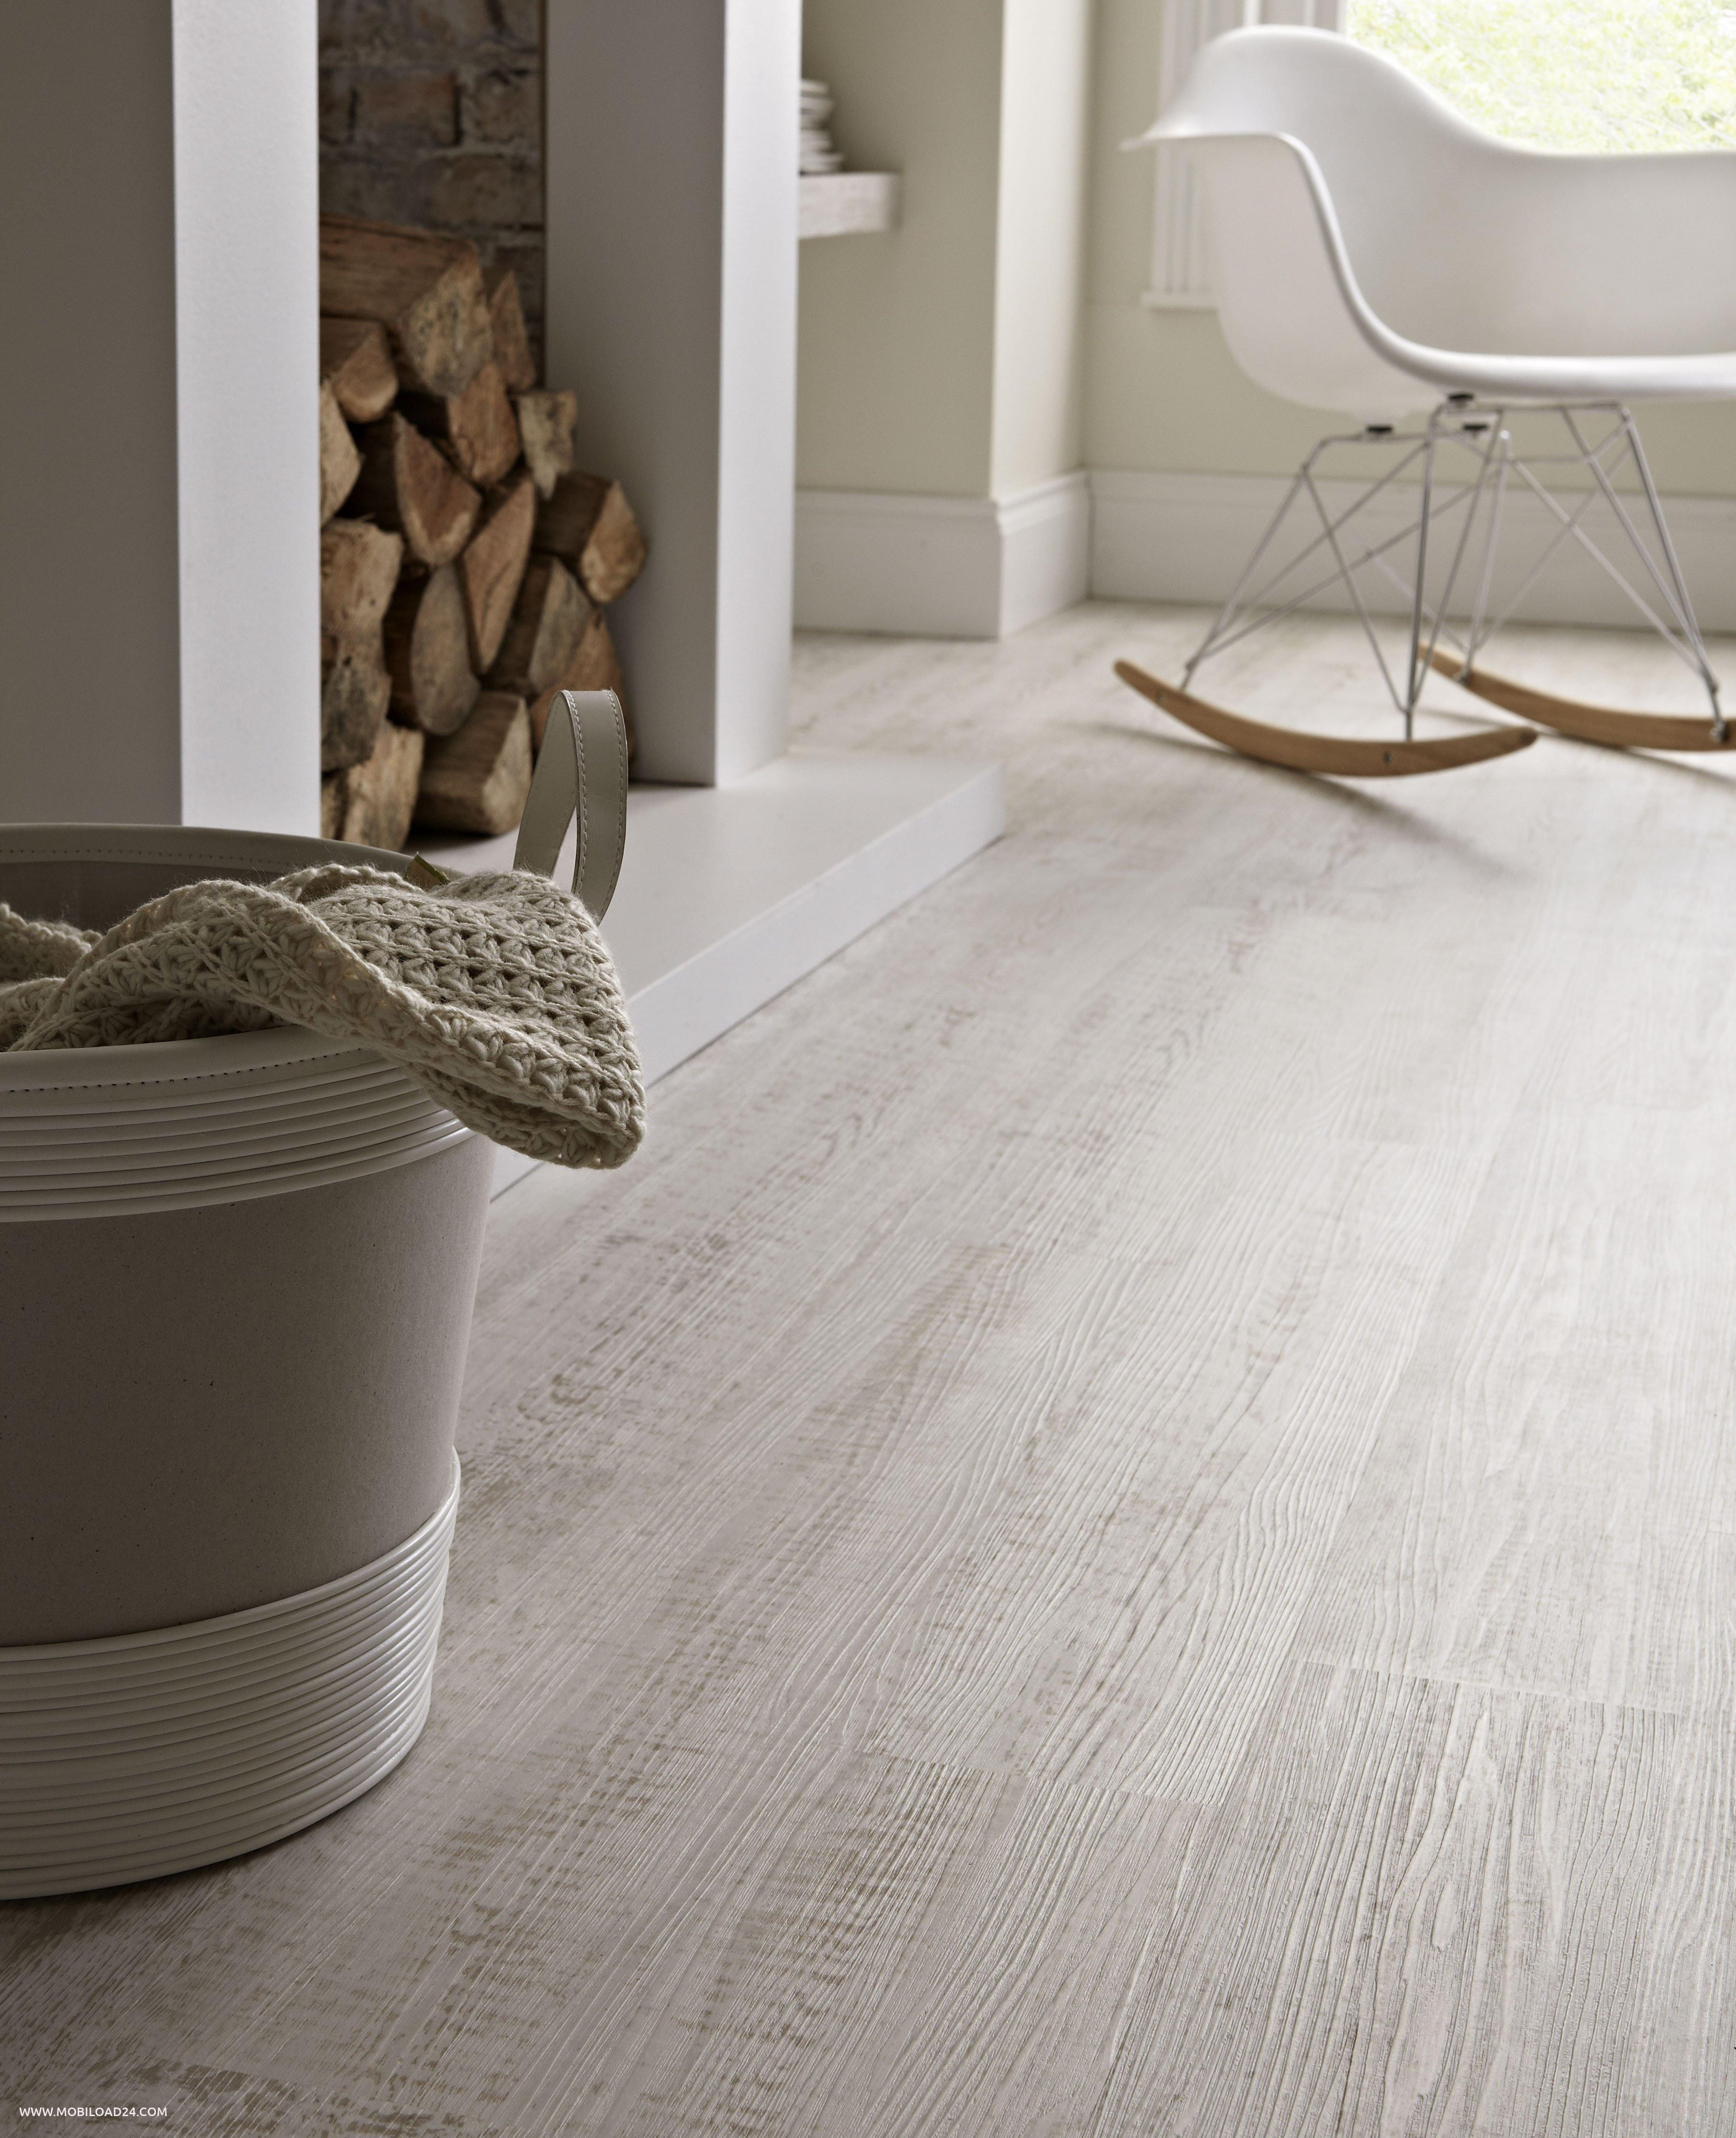 pictures of gray hardwood floors of ideas white washed hardwood floors mobiload24 new furniture ideas 2017 for grey hardwood floors bedroom beautiful white washed engineered wood